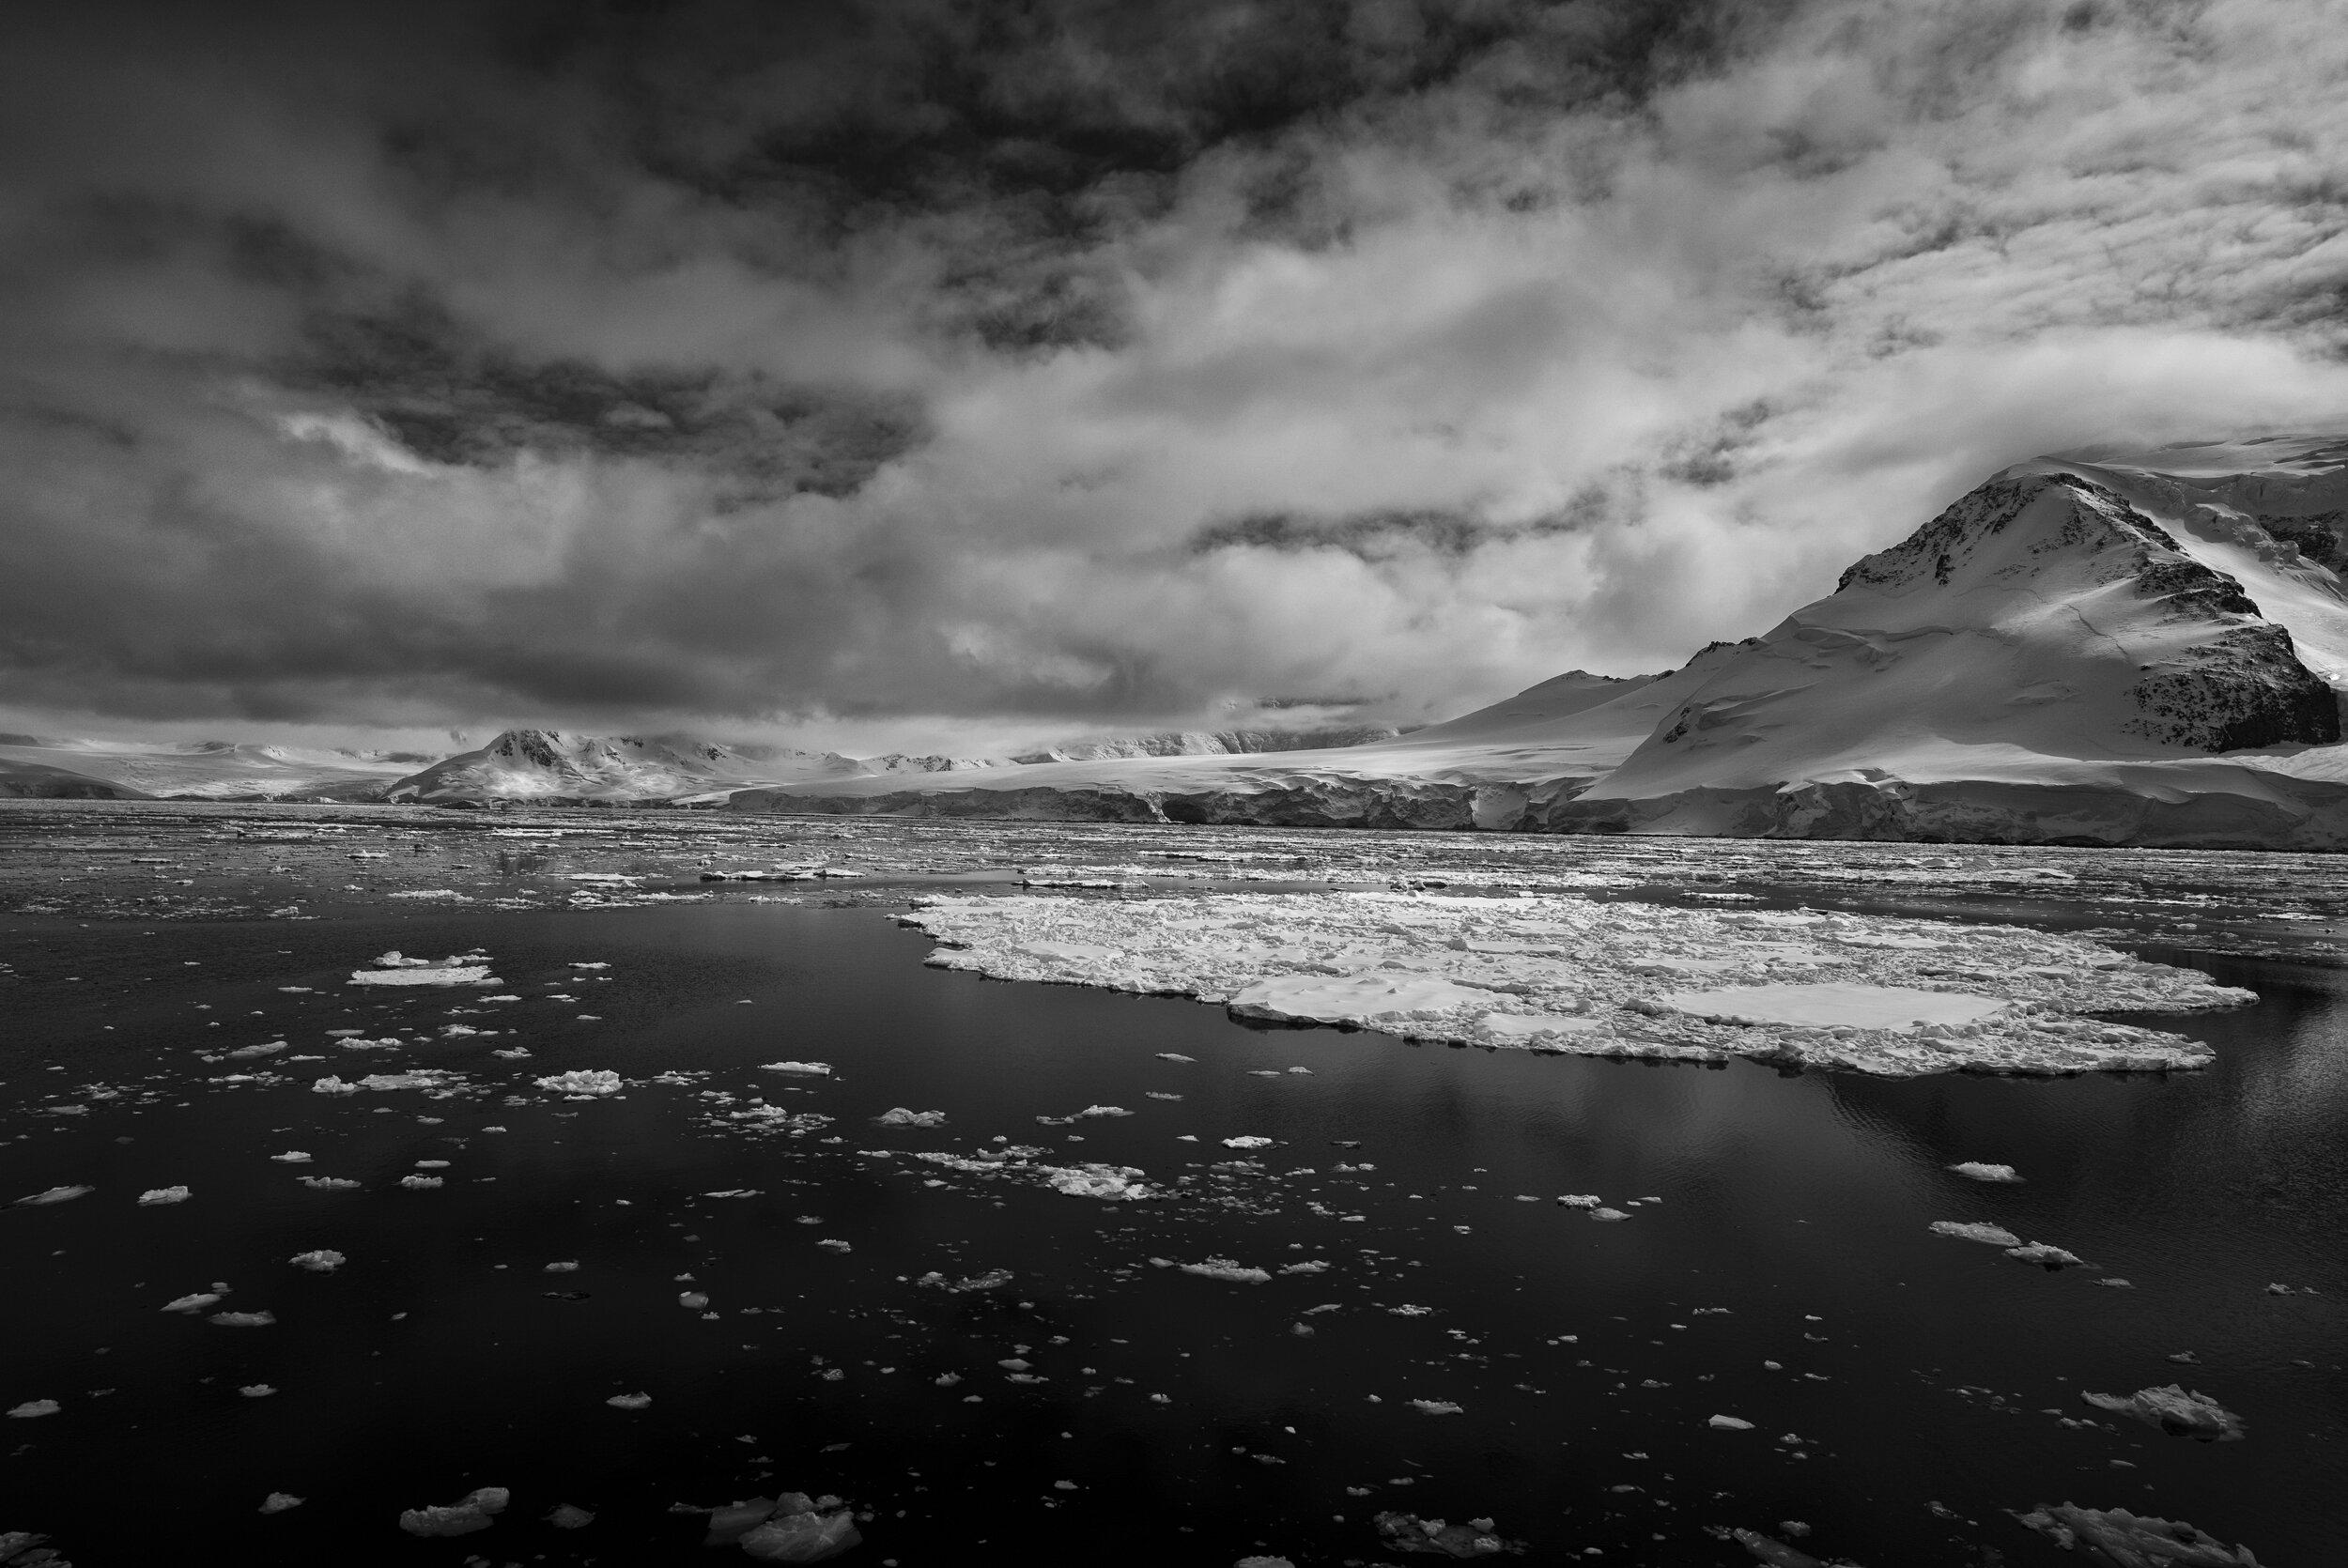 manuel_uebler_antarctica_bw_002.jpg